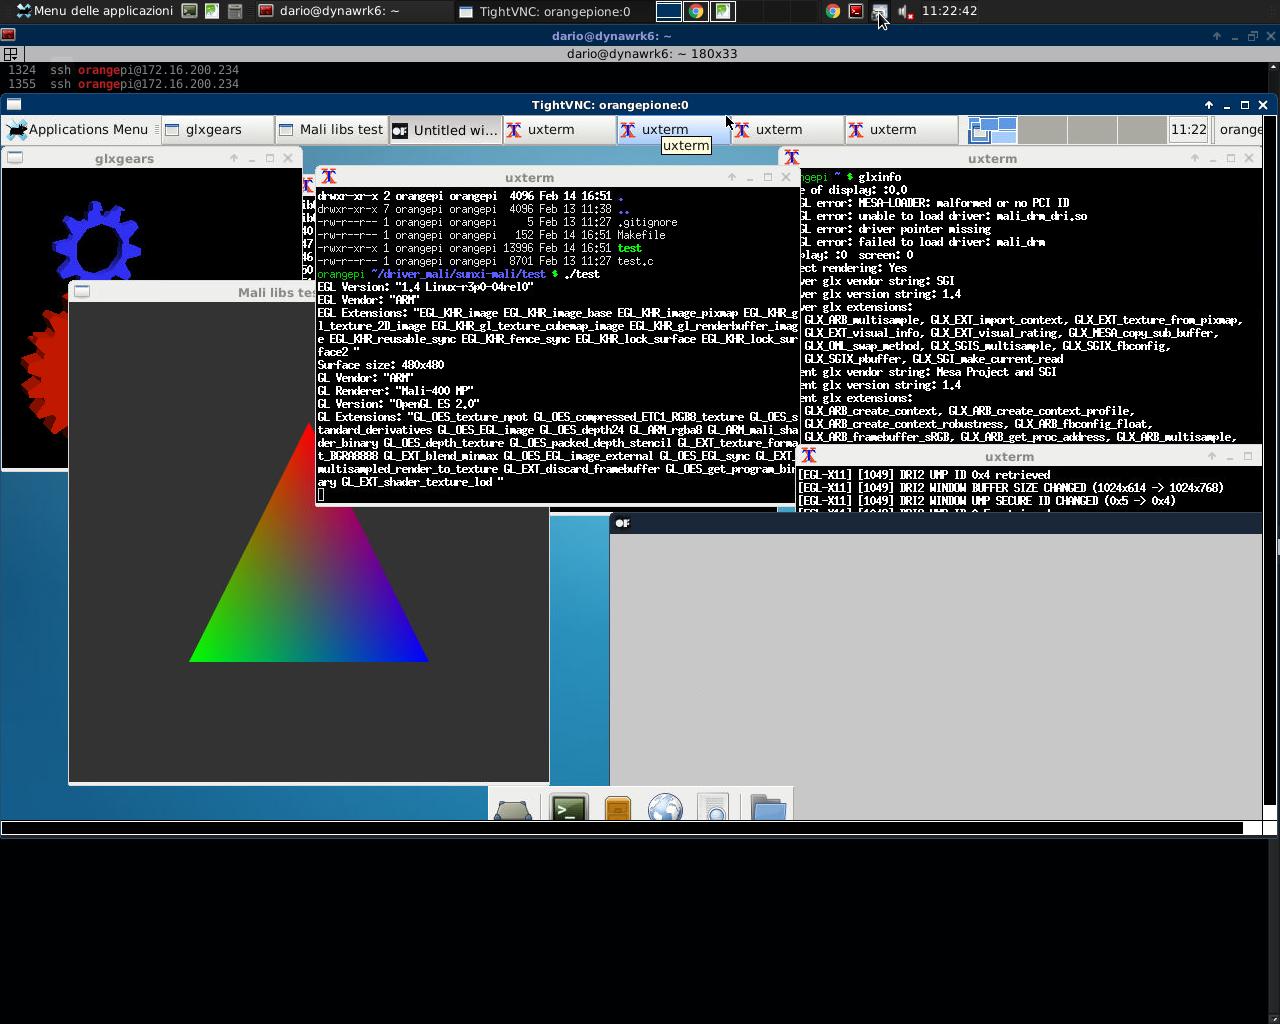 Guide install Driver OpenGL ES/ES2 for Mali GPU (orangepi